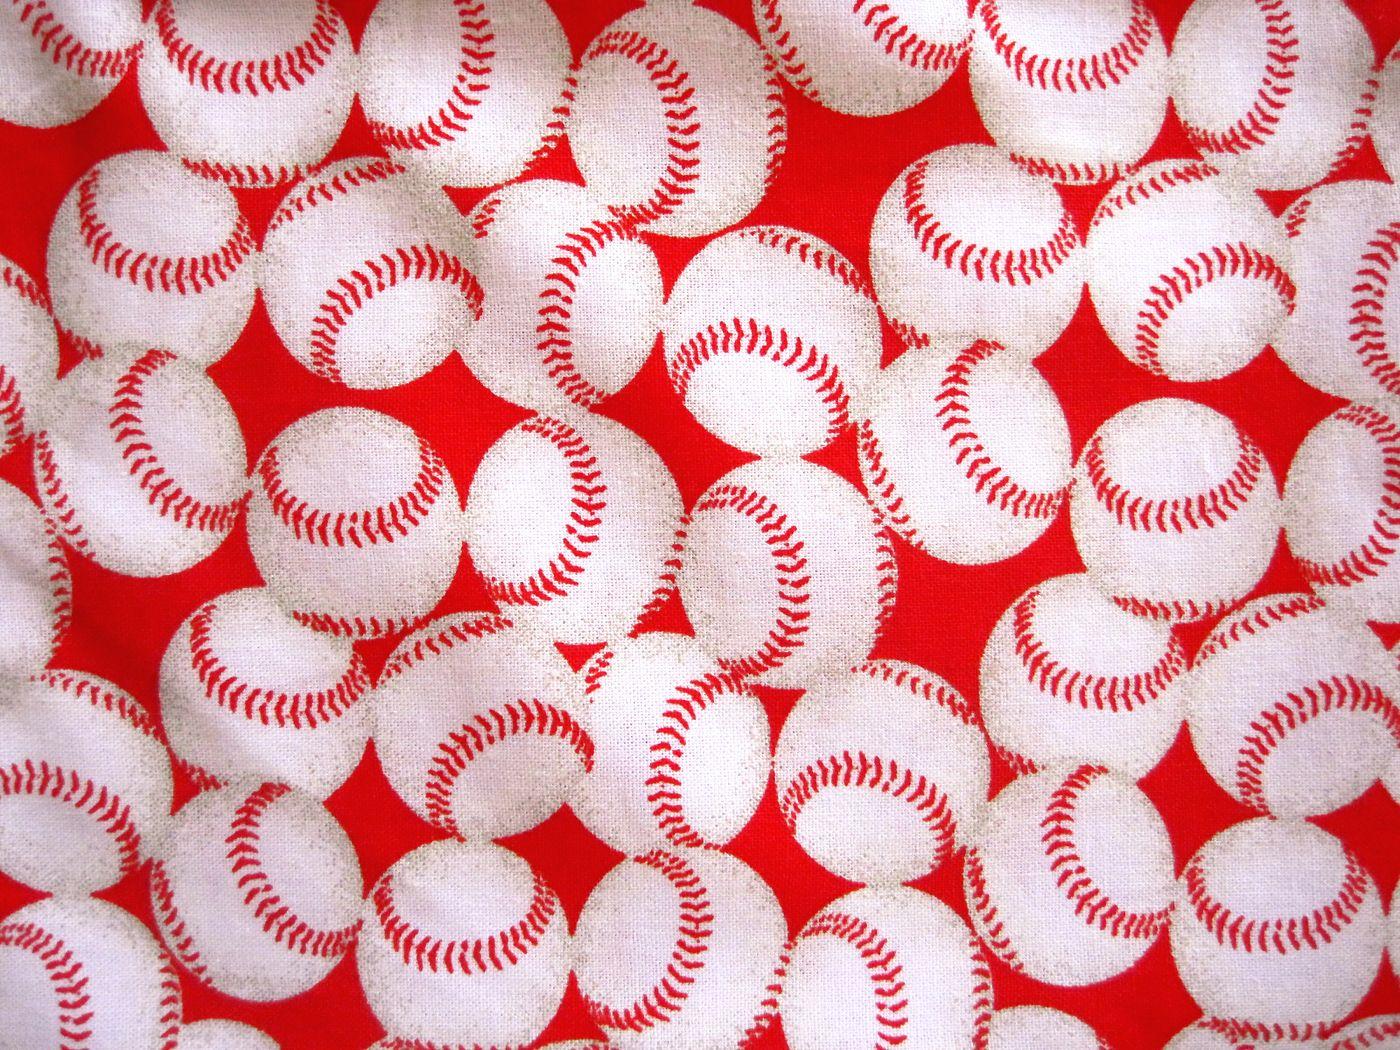 Vintage Baseball Quilting Fabric